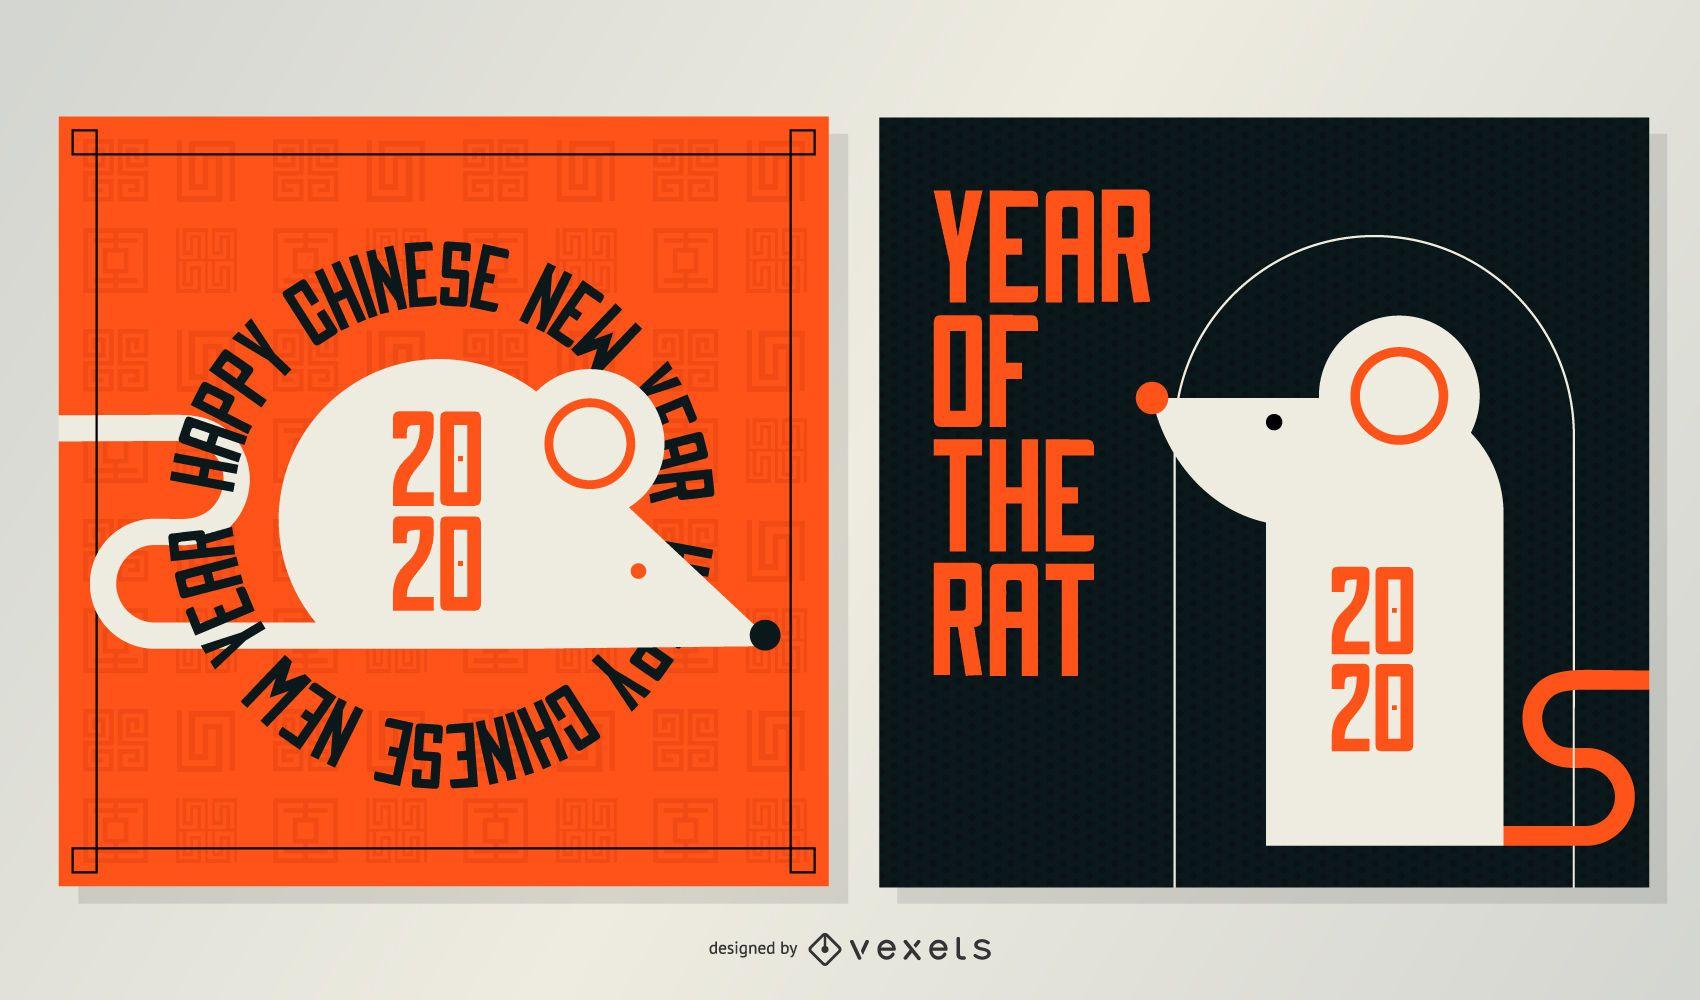 Chinese new year geometric banners